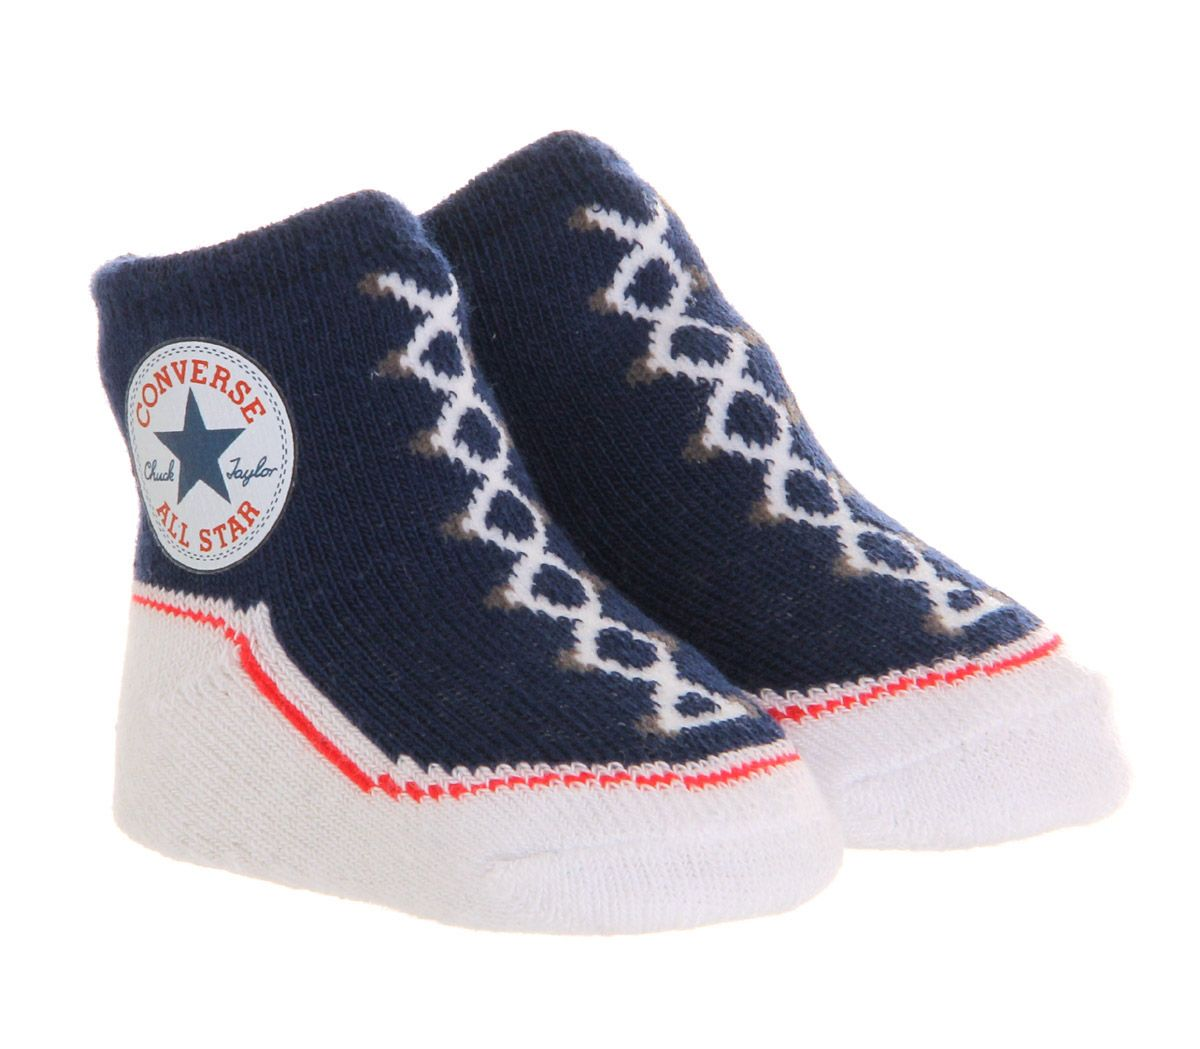 dd6077959 Converse Crib Socks Navy - Unisex